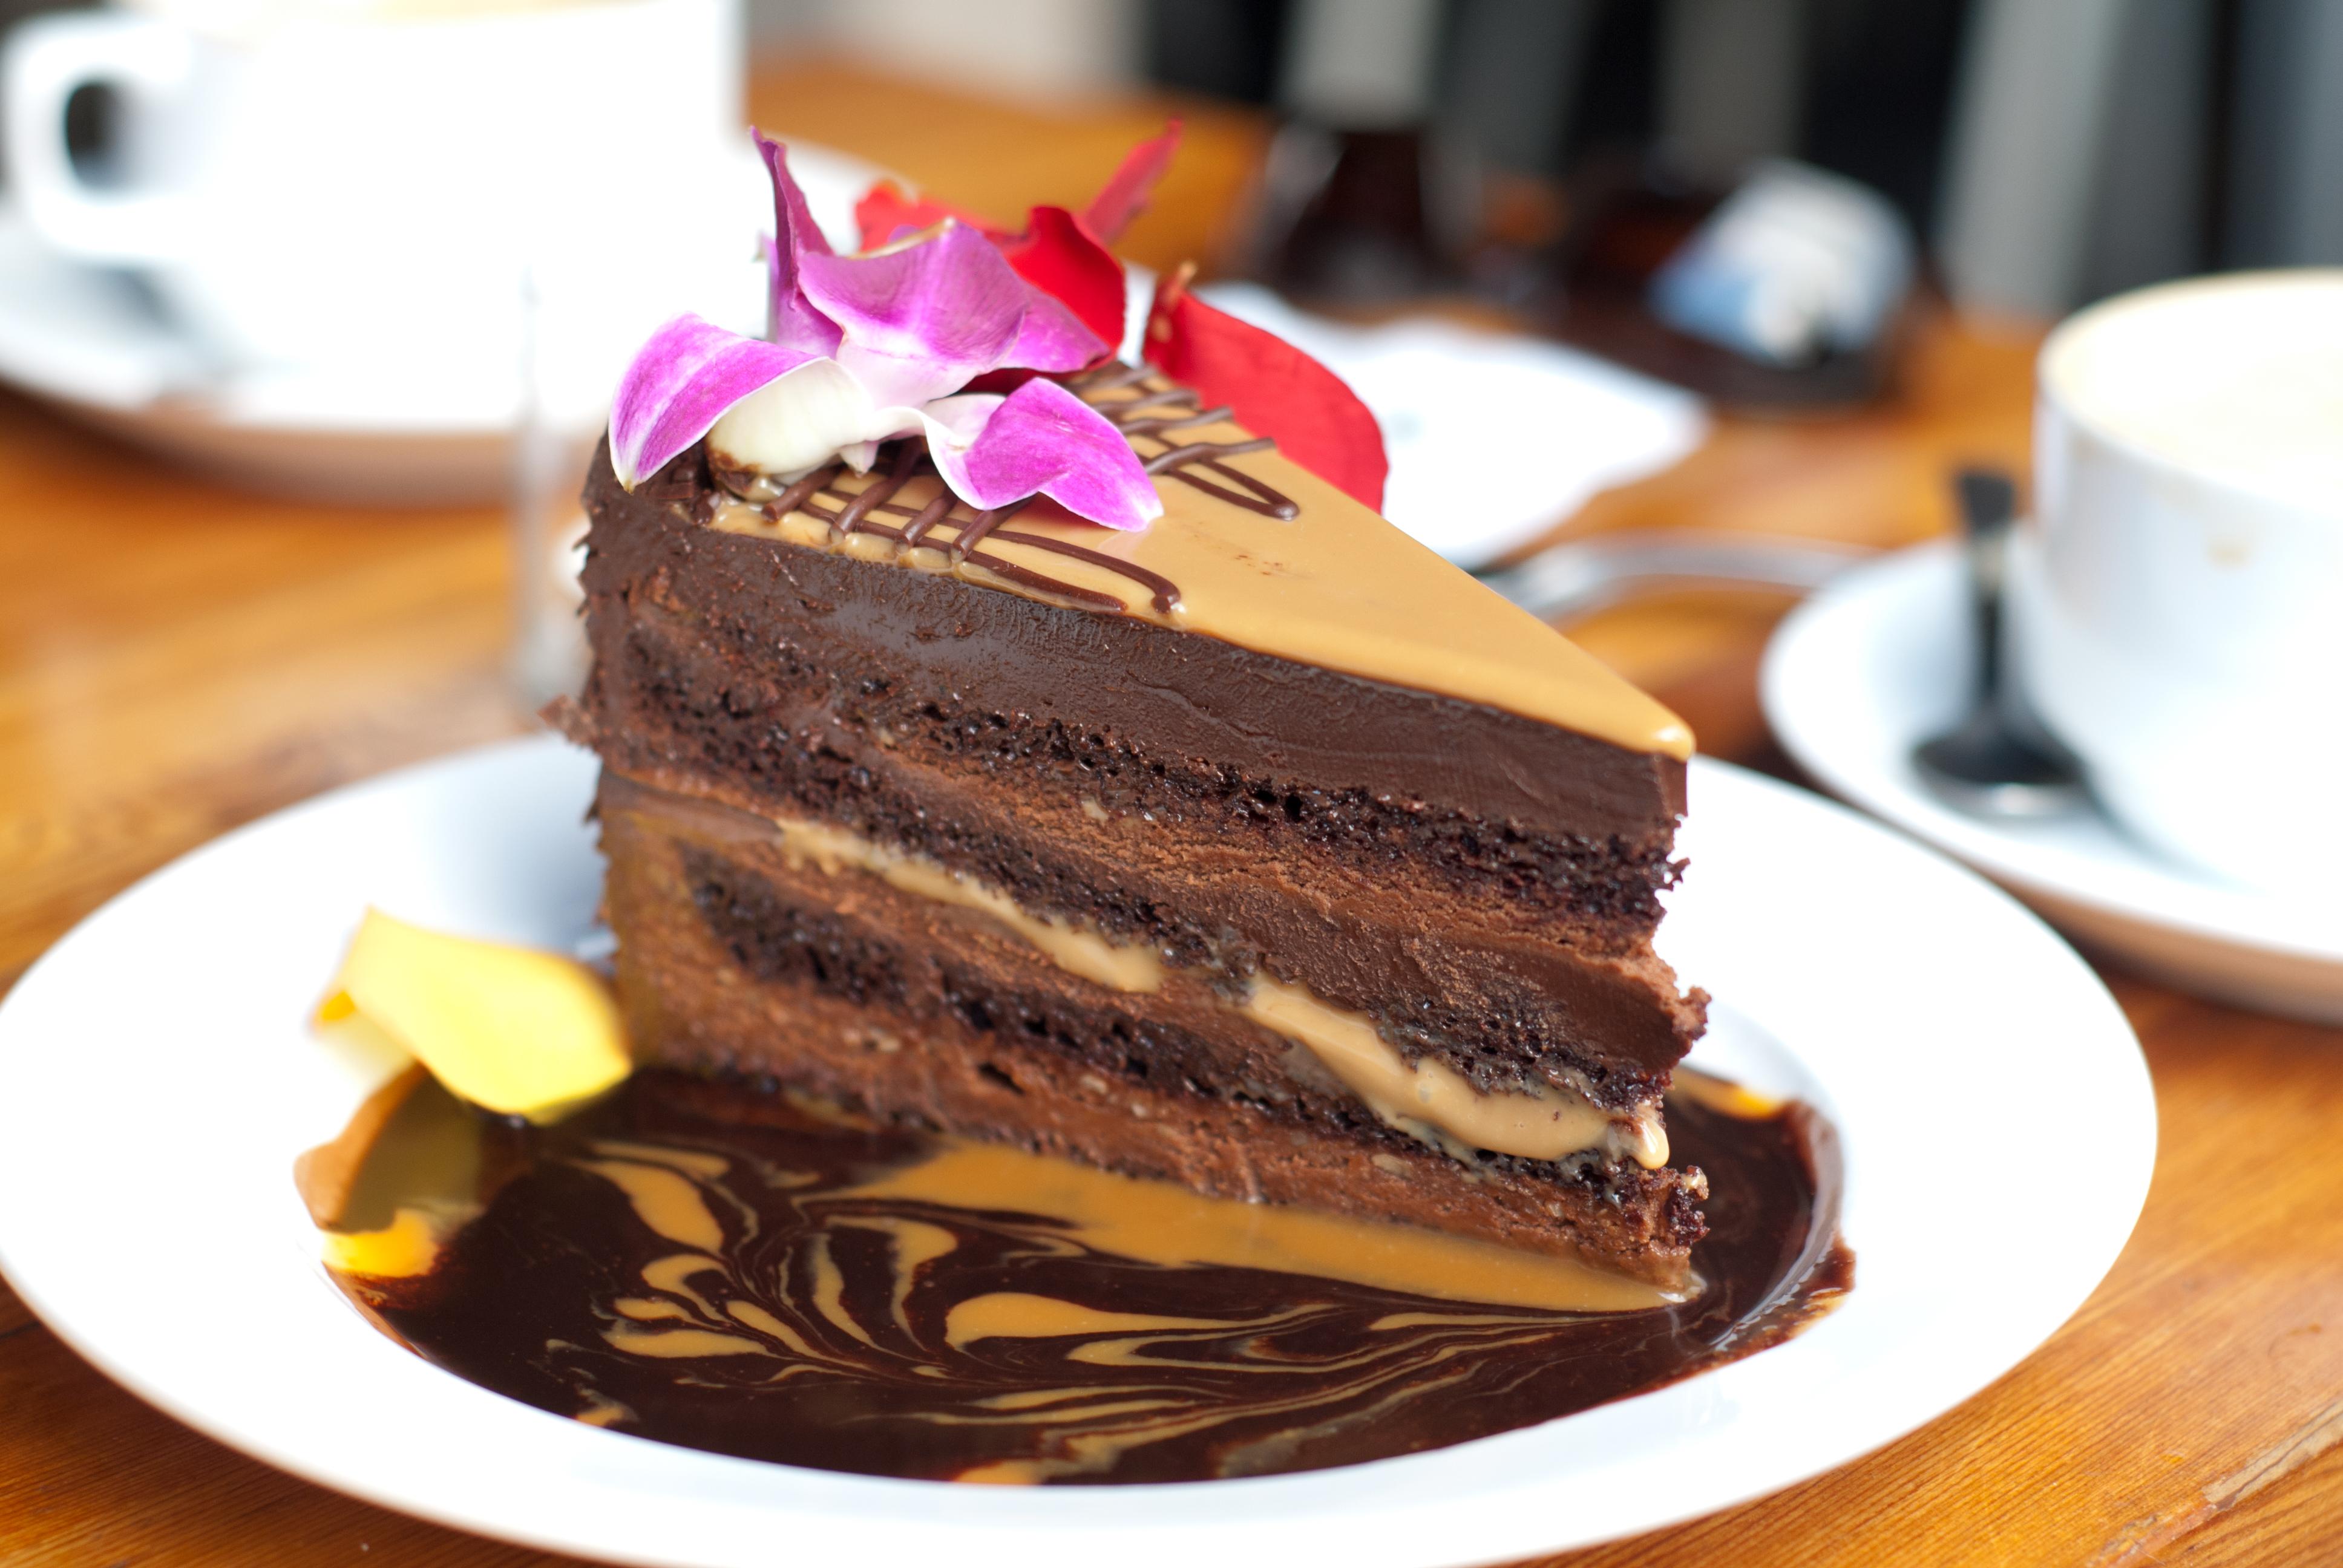 Extraordinary_Desserts_Dulce_De_Leche_Cake